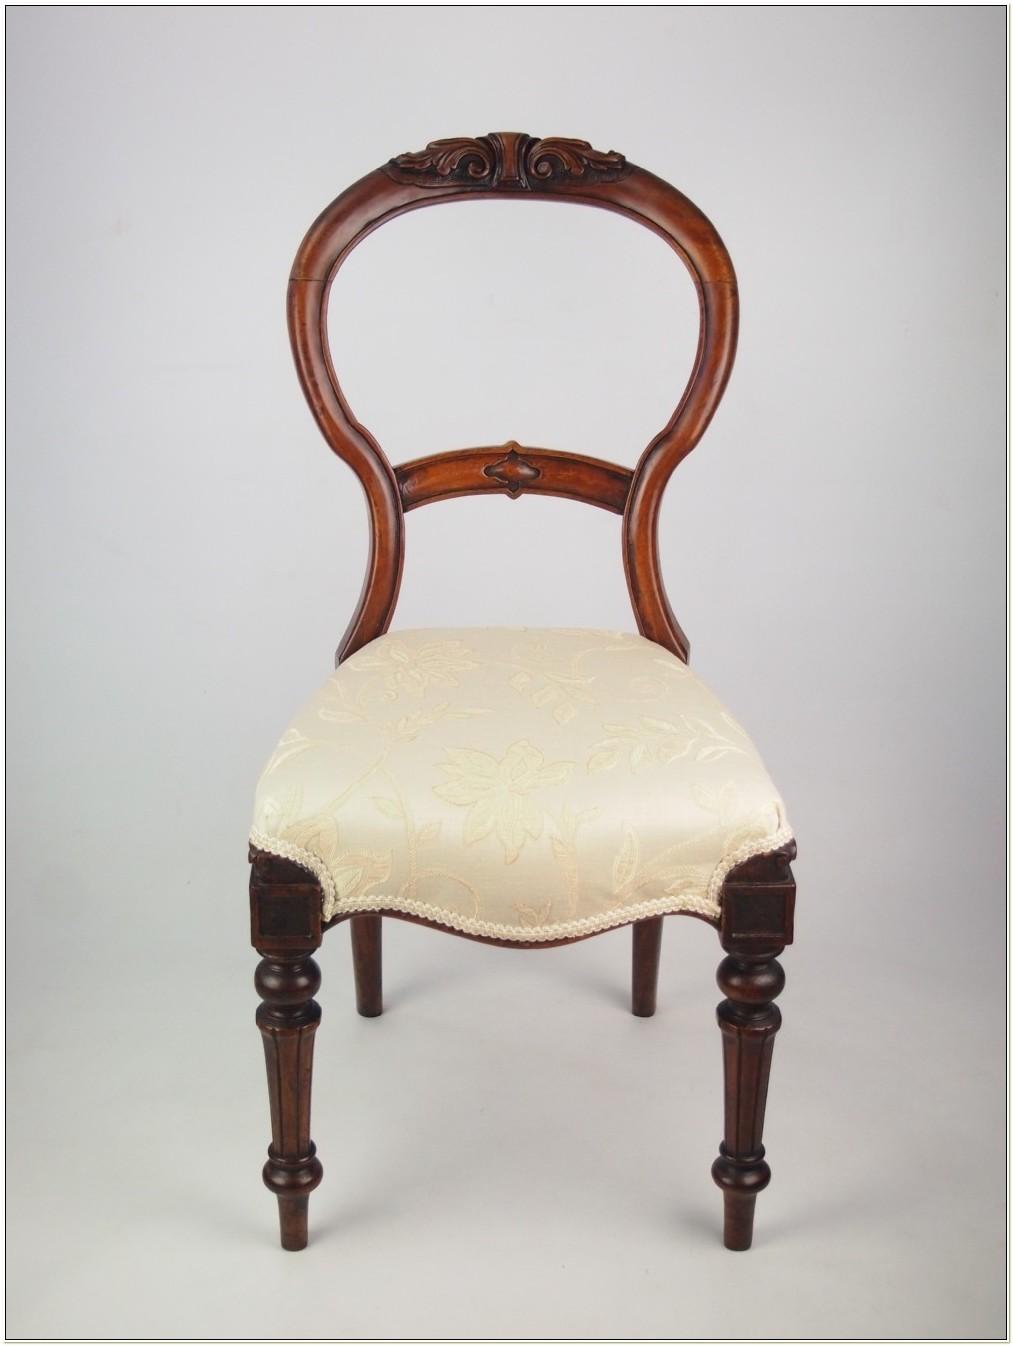 Antique Mahogany Balloon Back Chairs